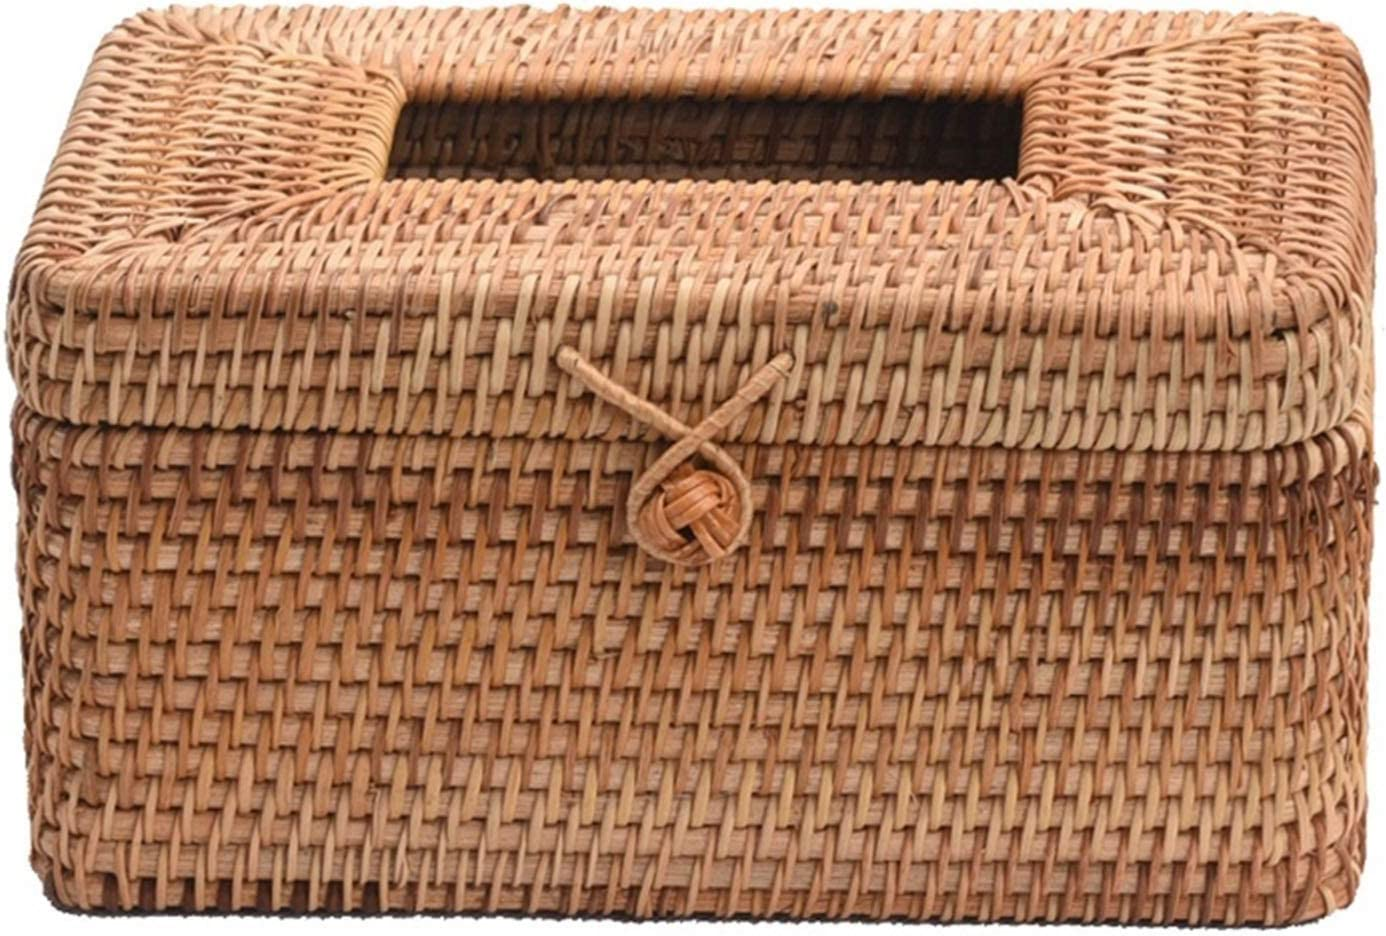 Electric Max New life 50% OFF oven Handmade Rattan Creative Box Exquisi Tissue Retro